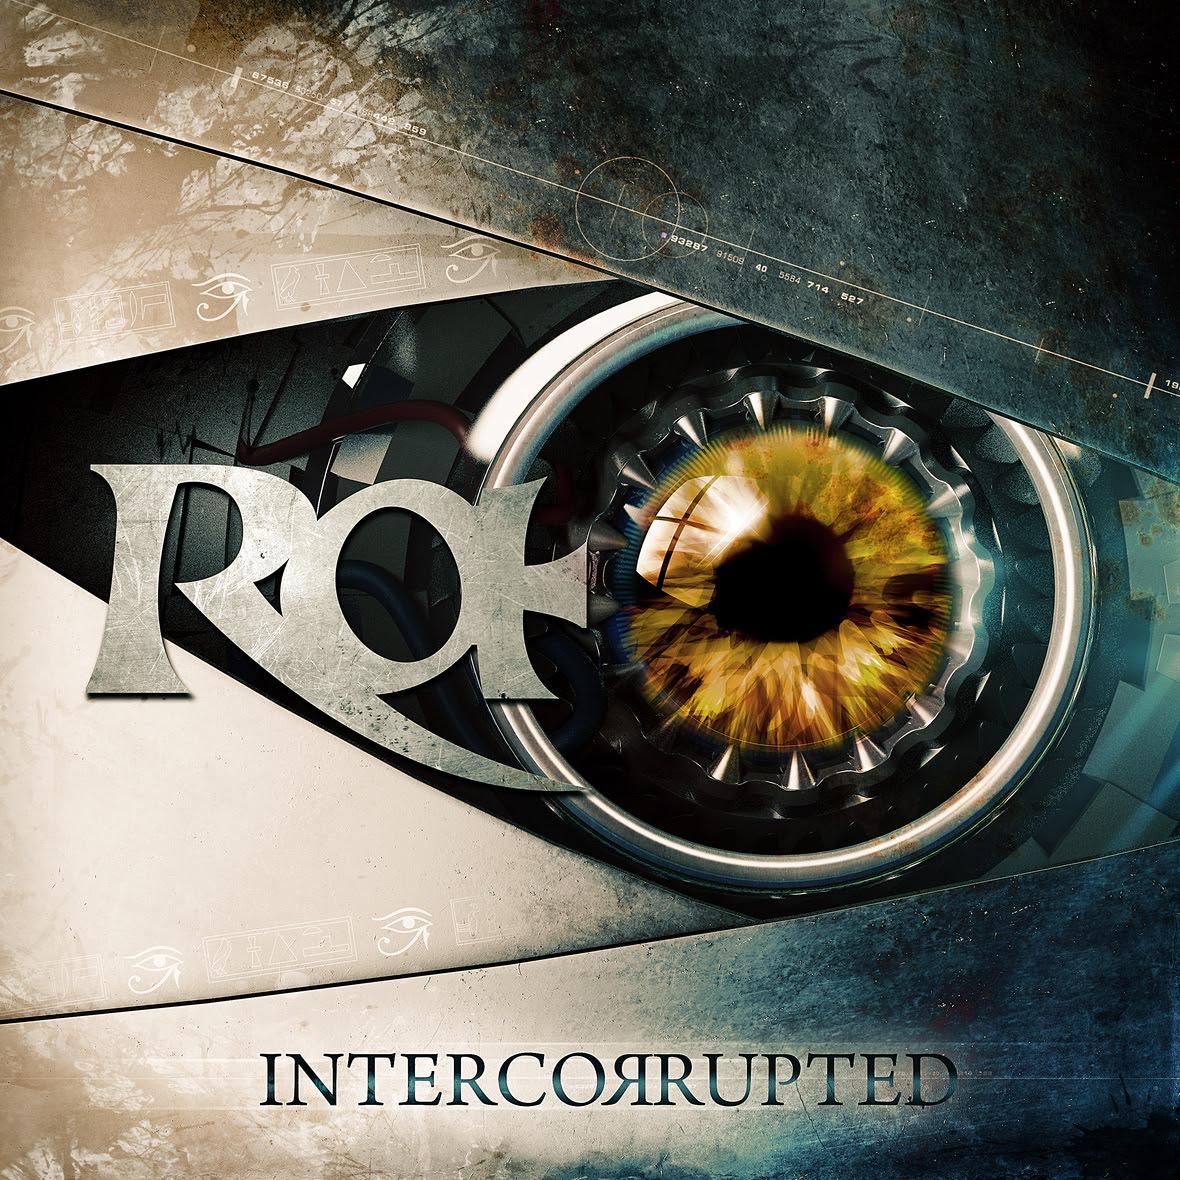 RA intercorrupted